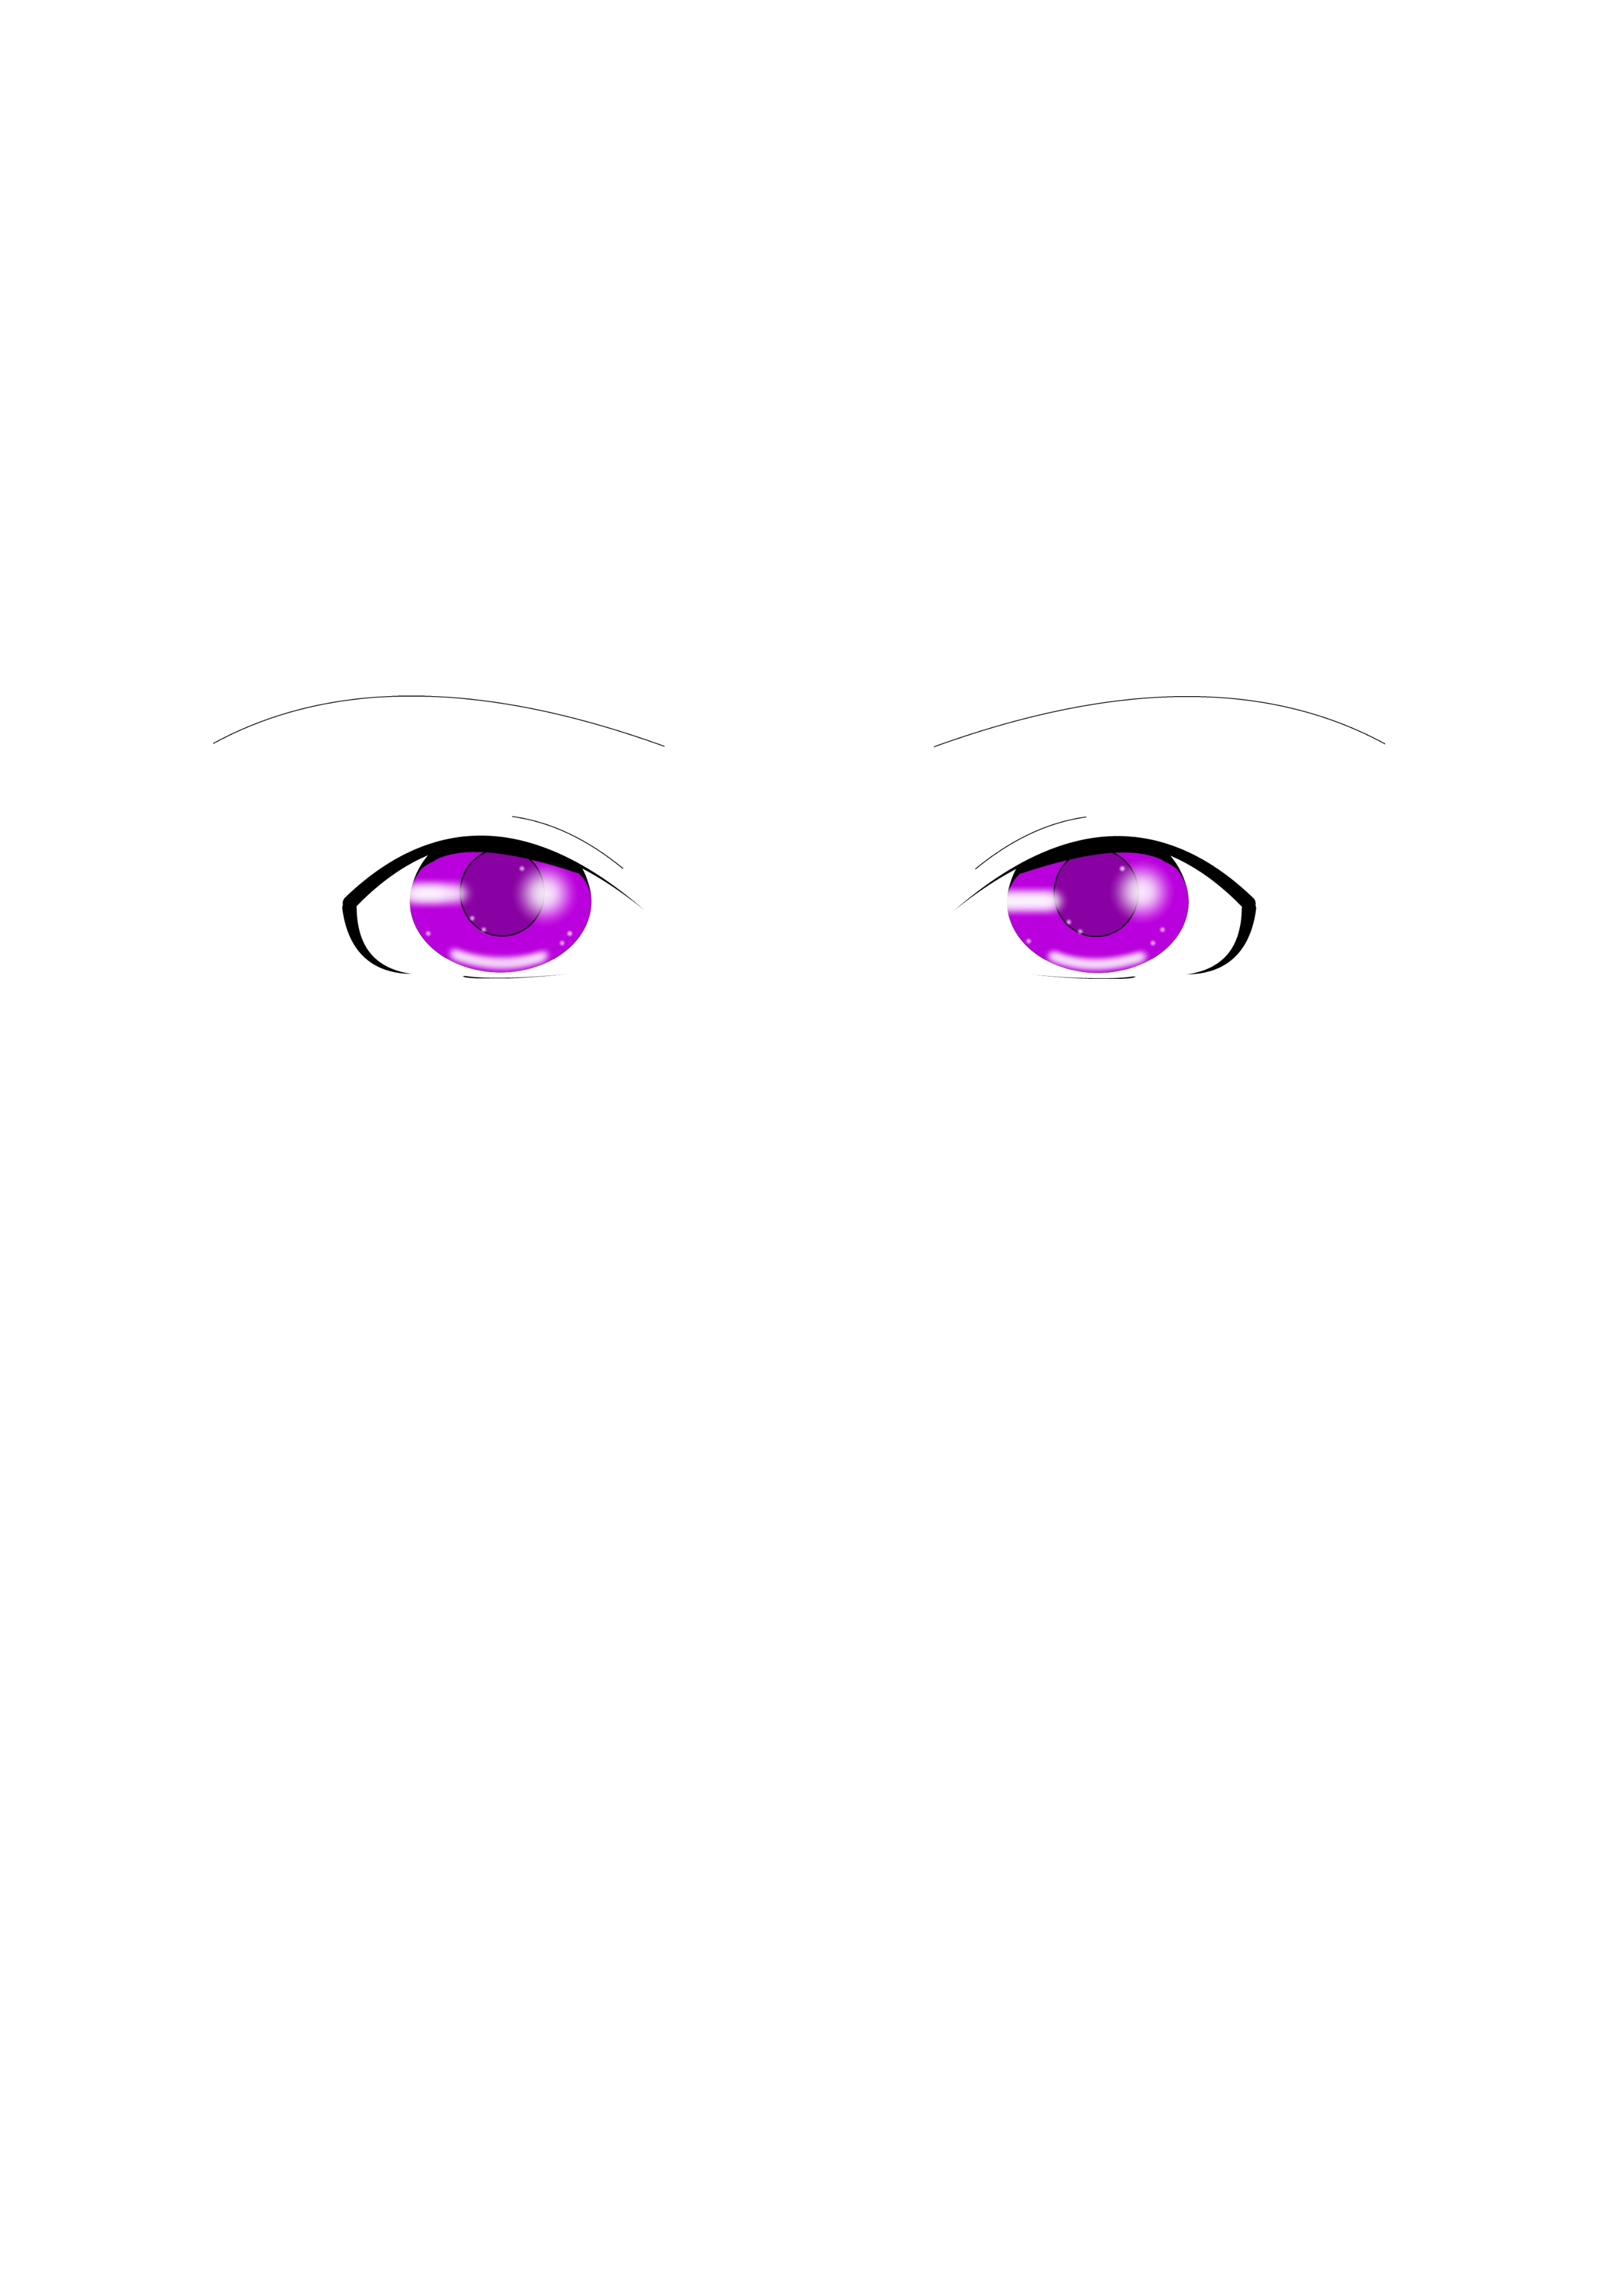 Manga Eyes v10.0